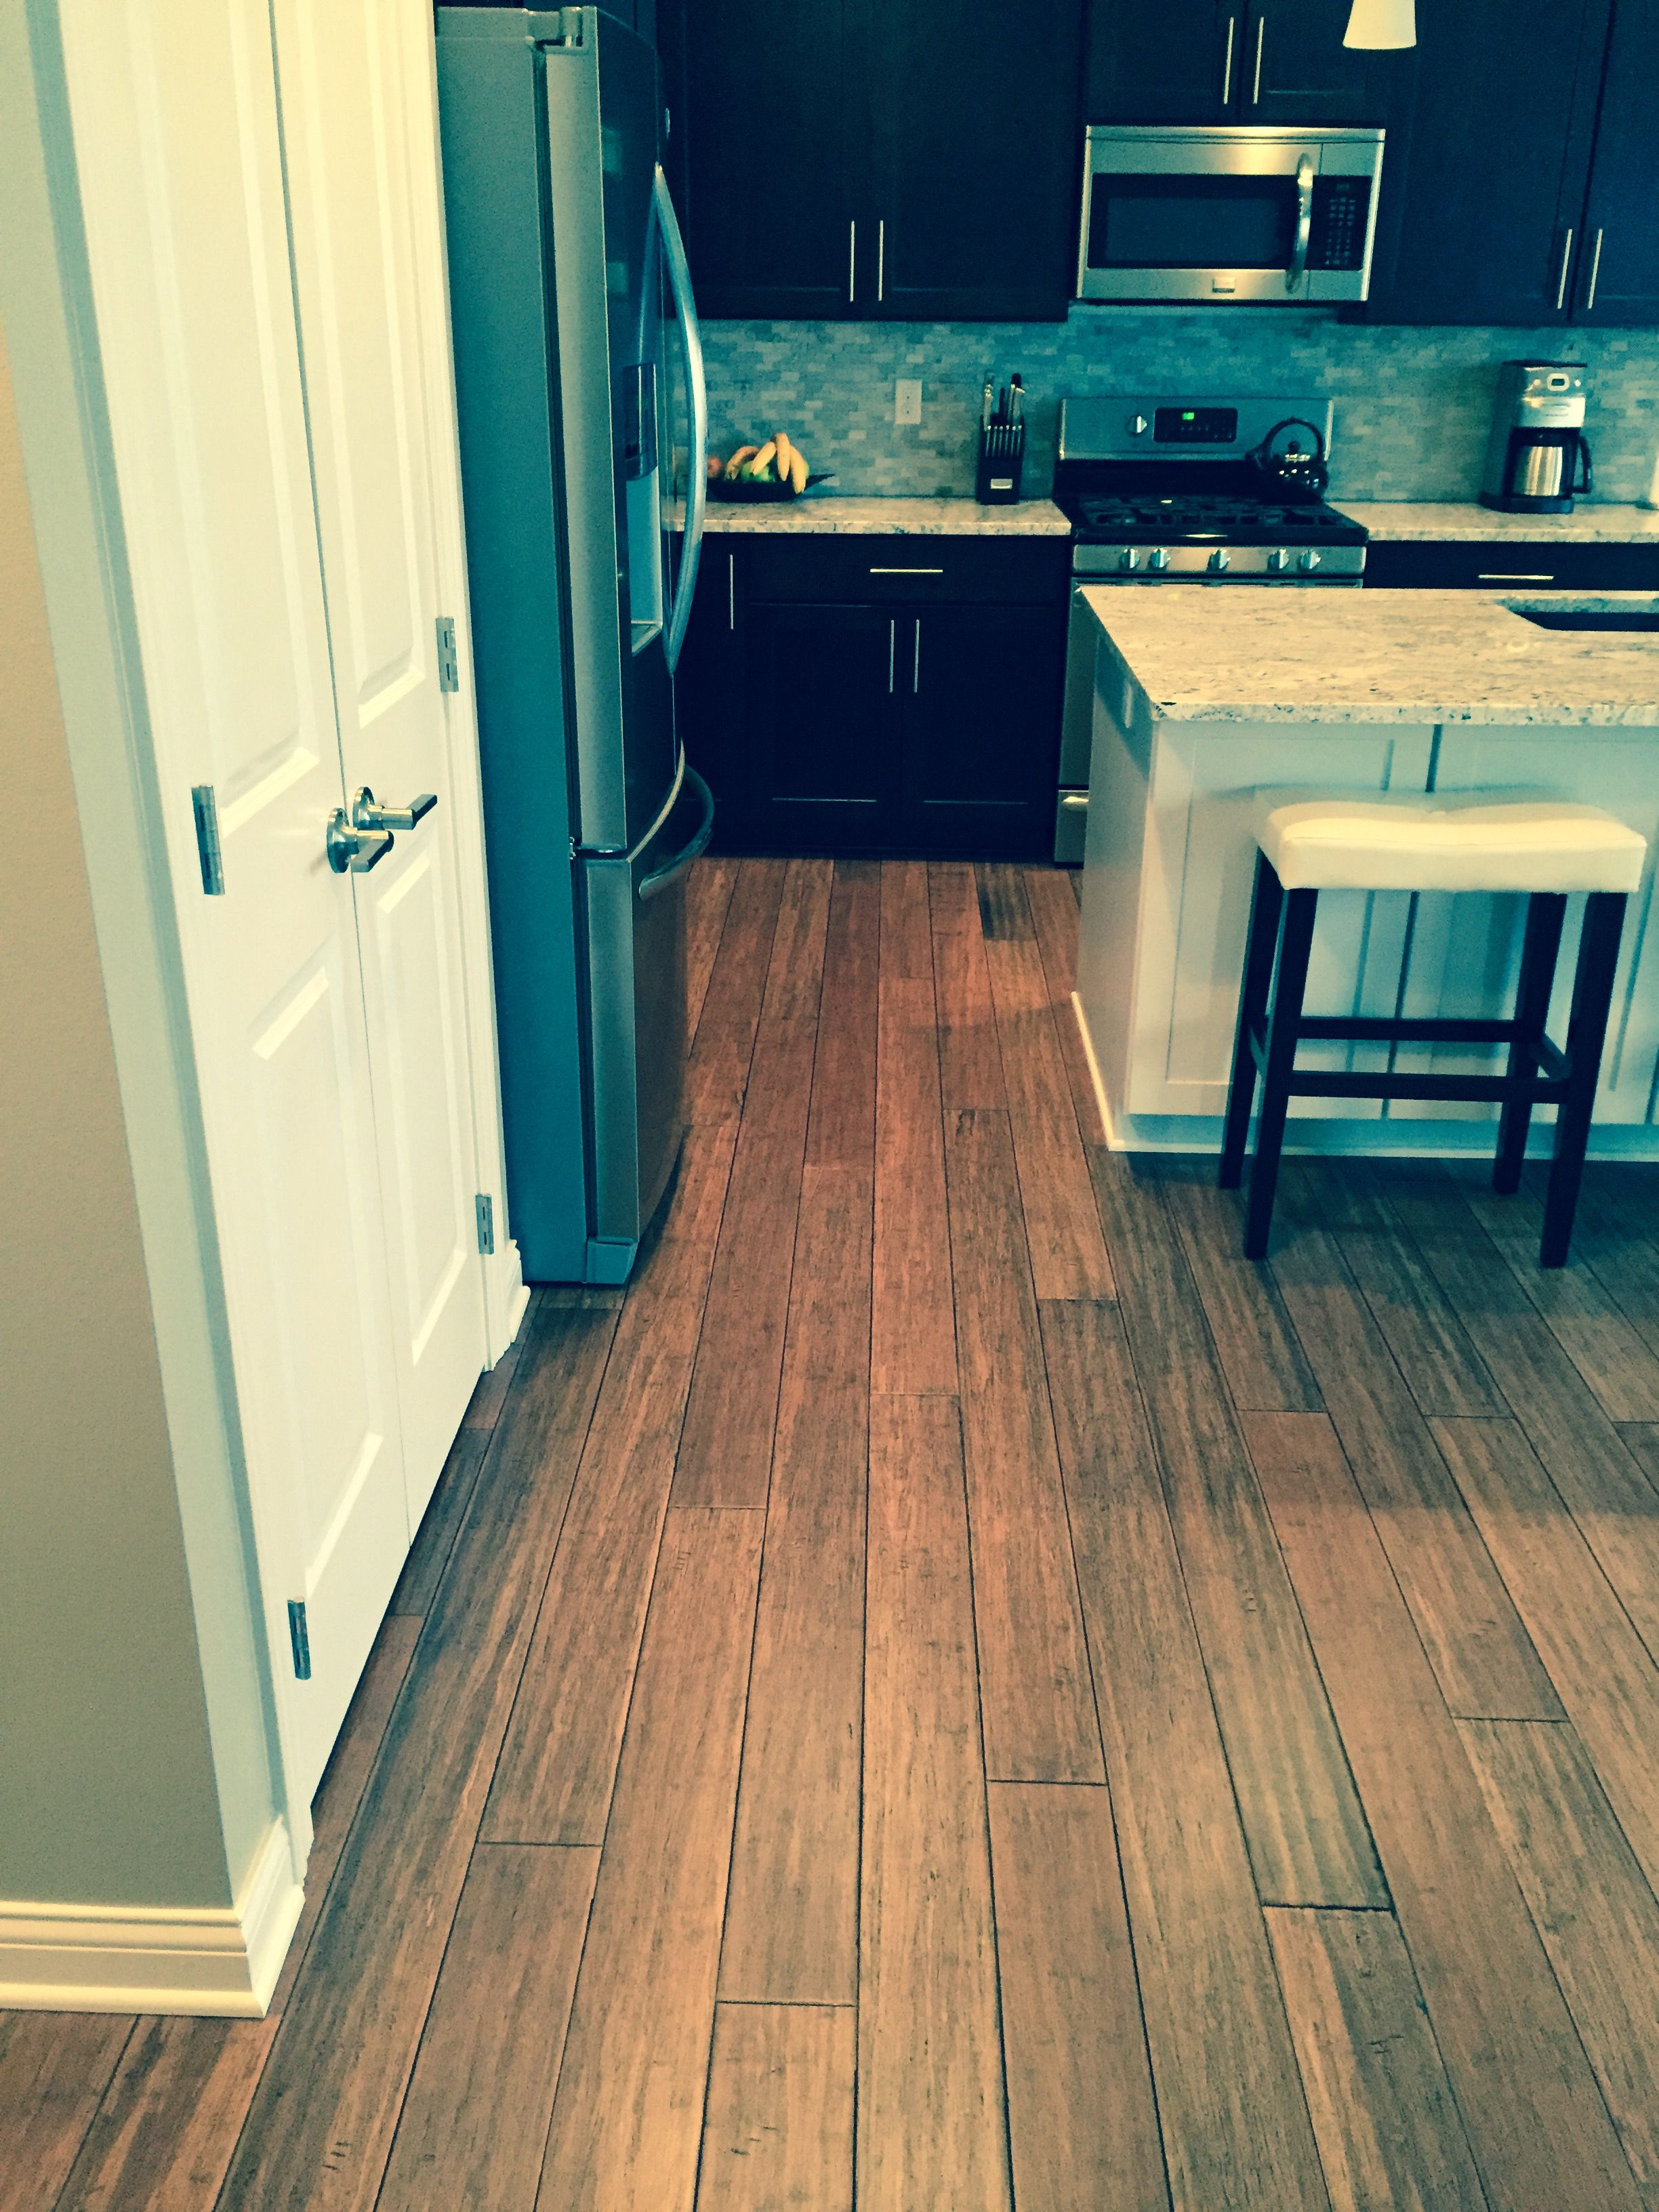 bamboo woodpecker oxwich strand floor natural flooring